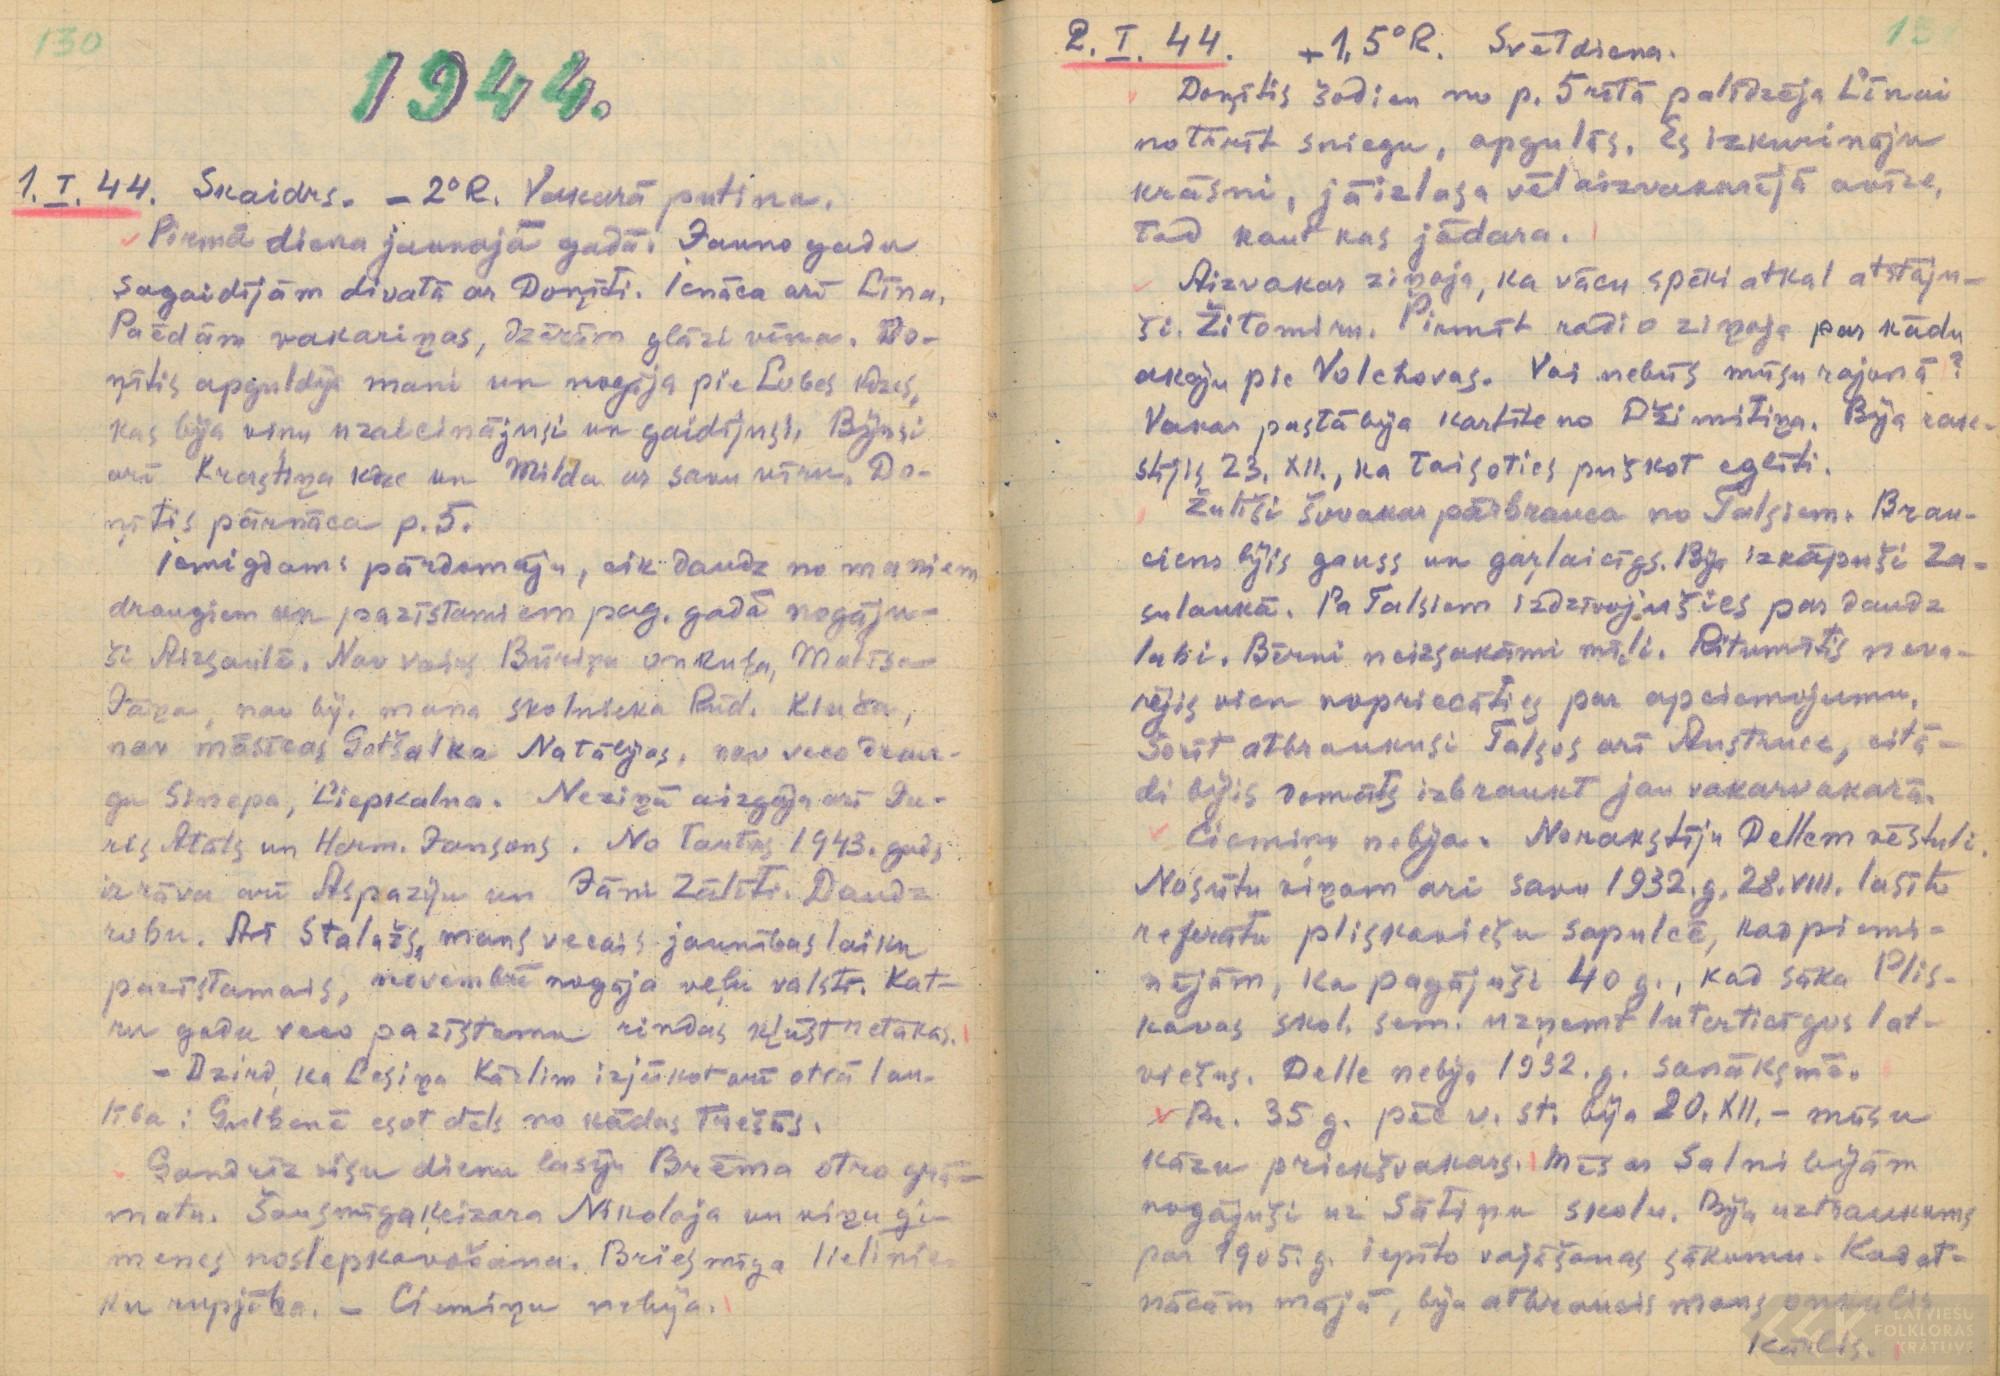 Ak26-Alvila-Kalniesa-dienasgramata-11-0208